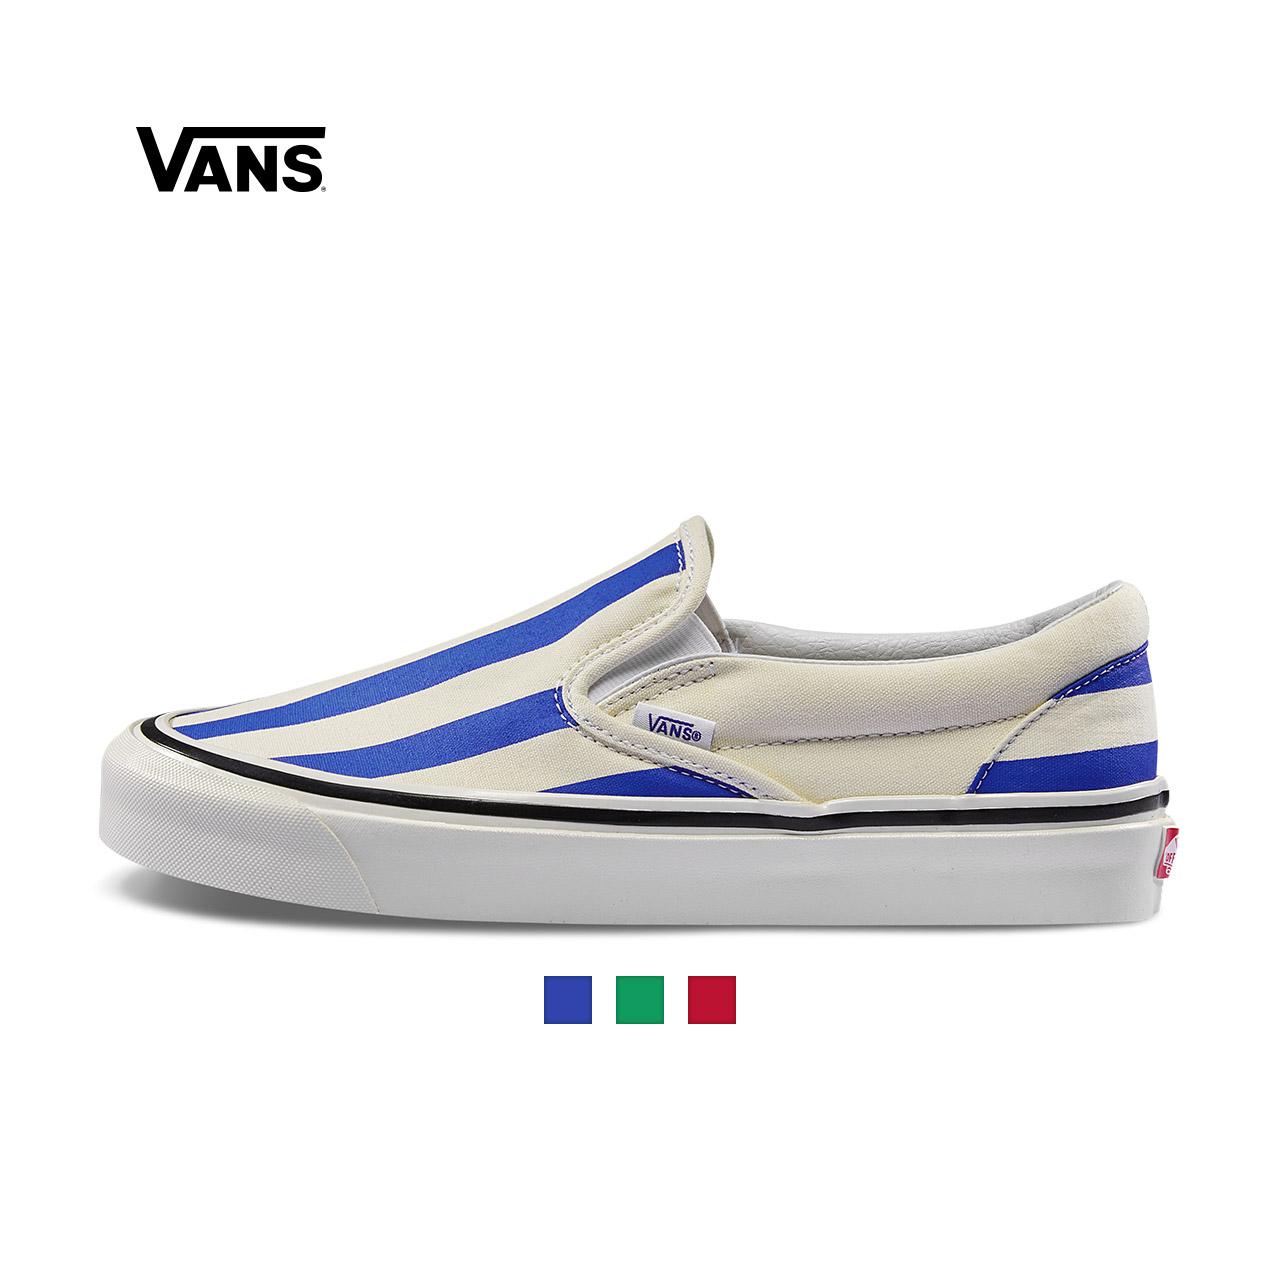 Vans范斯 经典系列 Slip-On帆布鞋 安纳海姆低帮男女官方正品